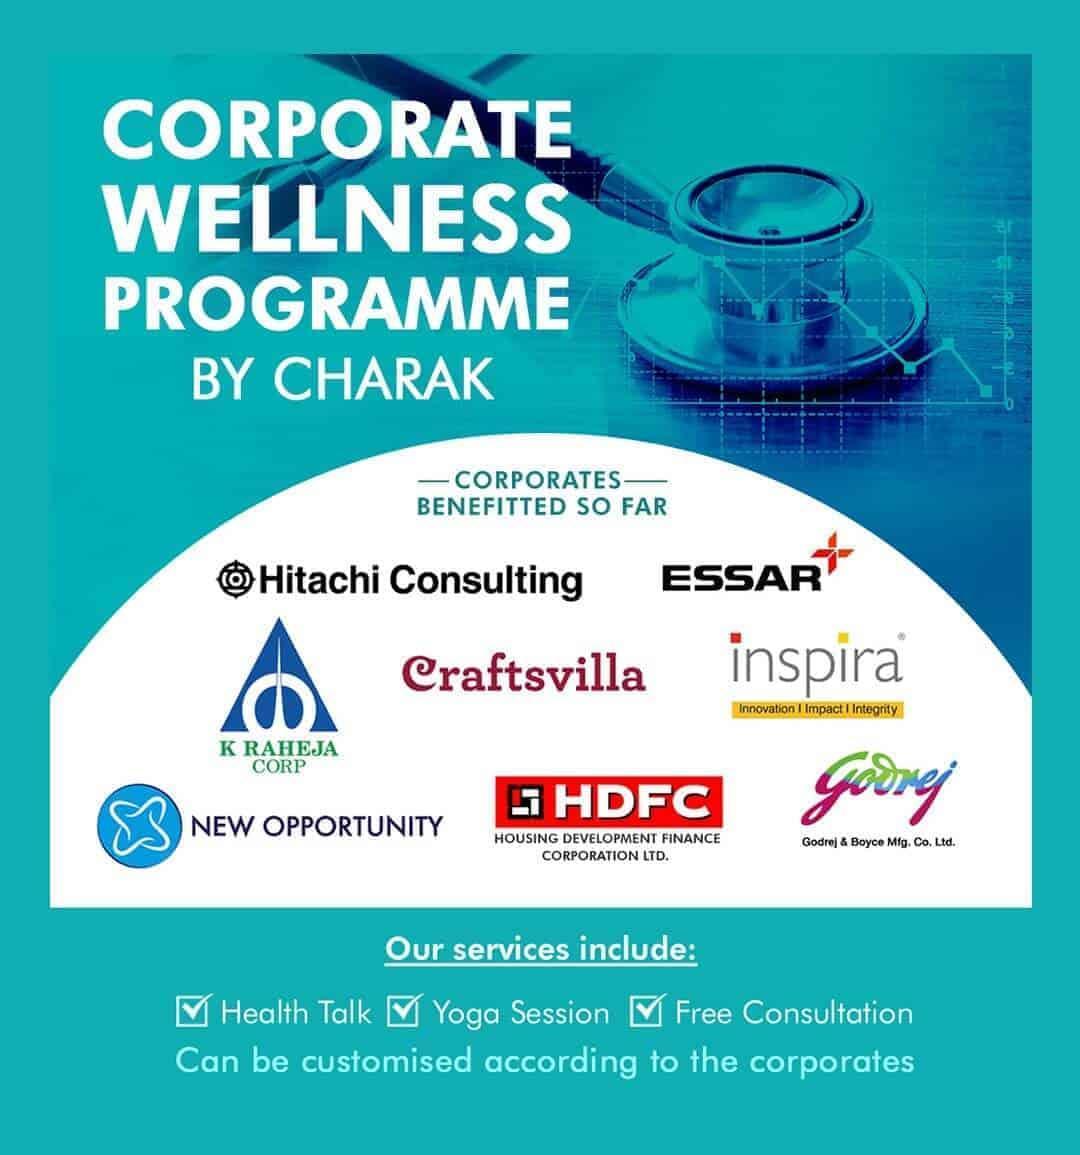 Corporate Wellness Programme by Charak Pharma